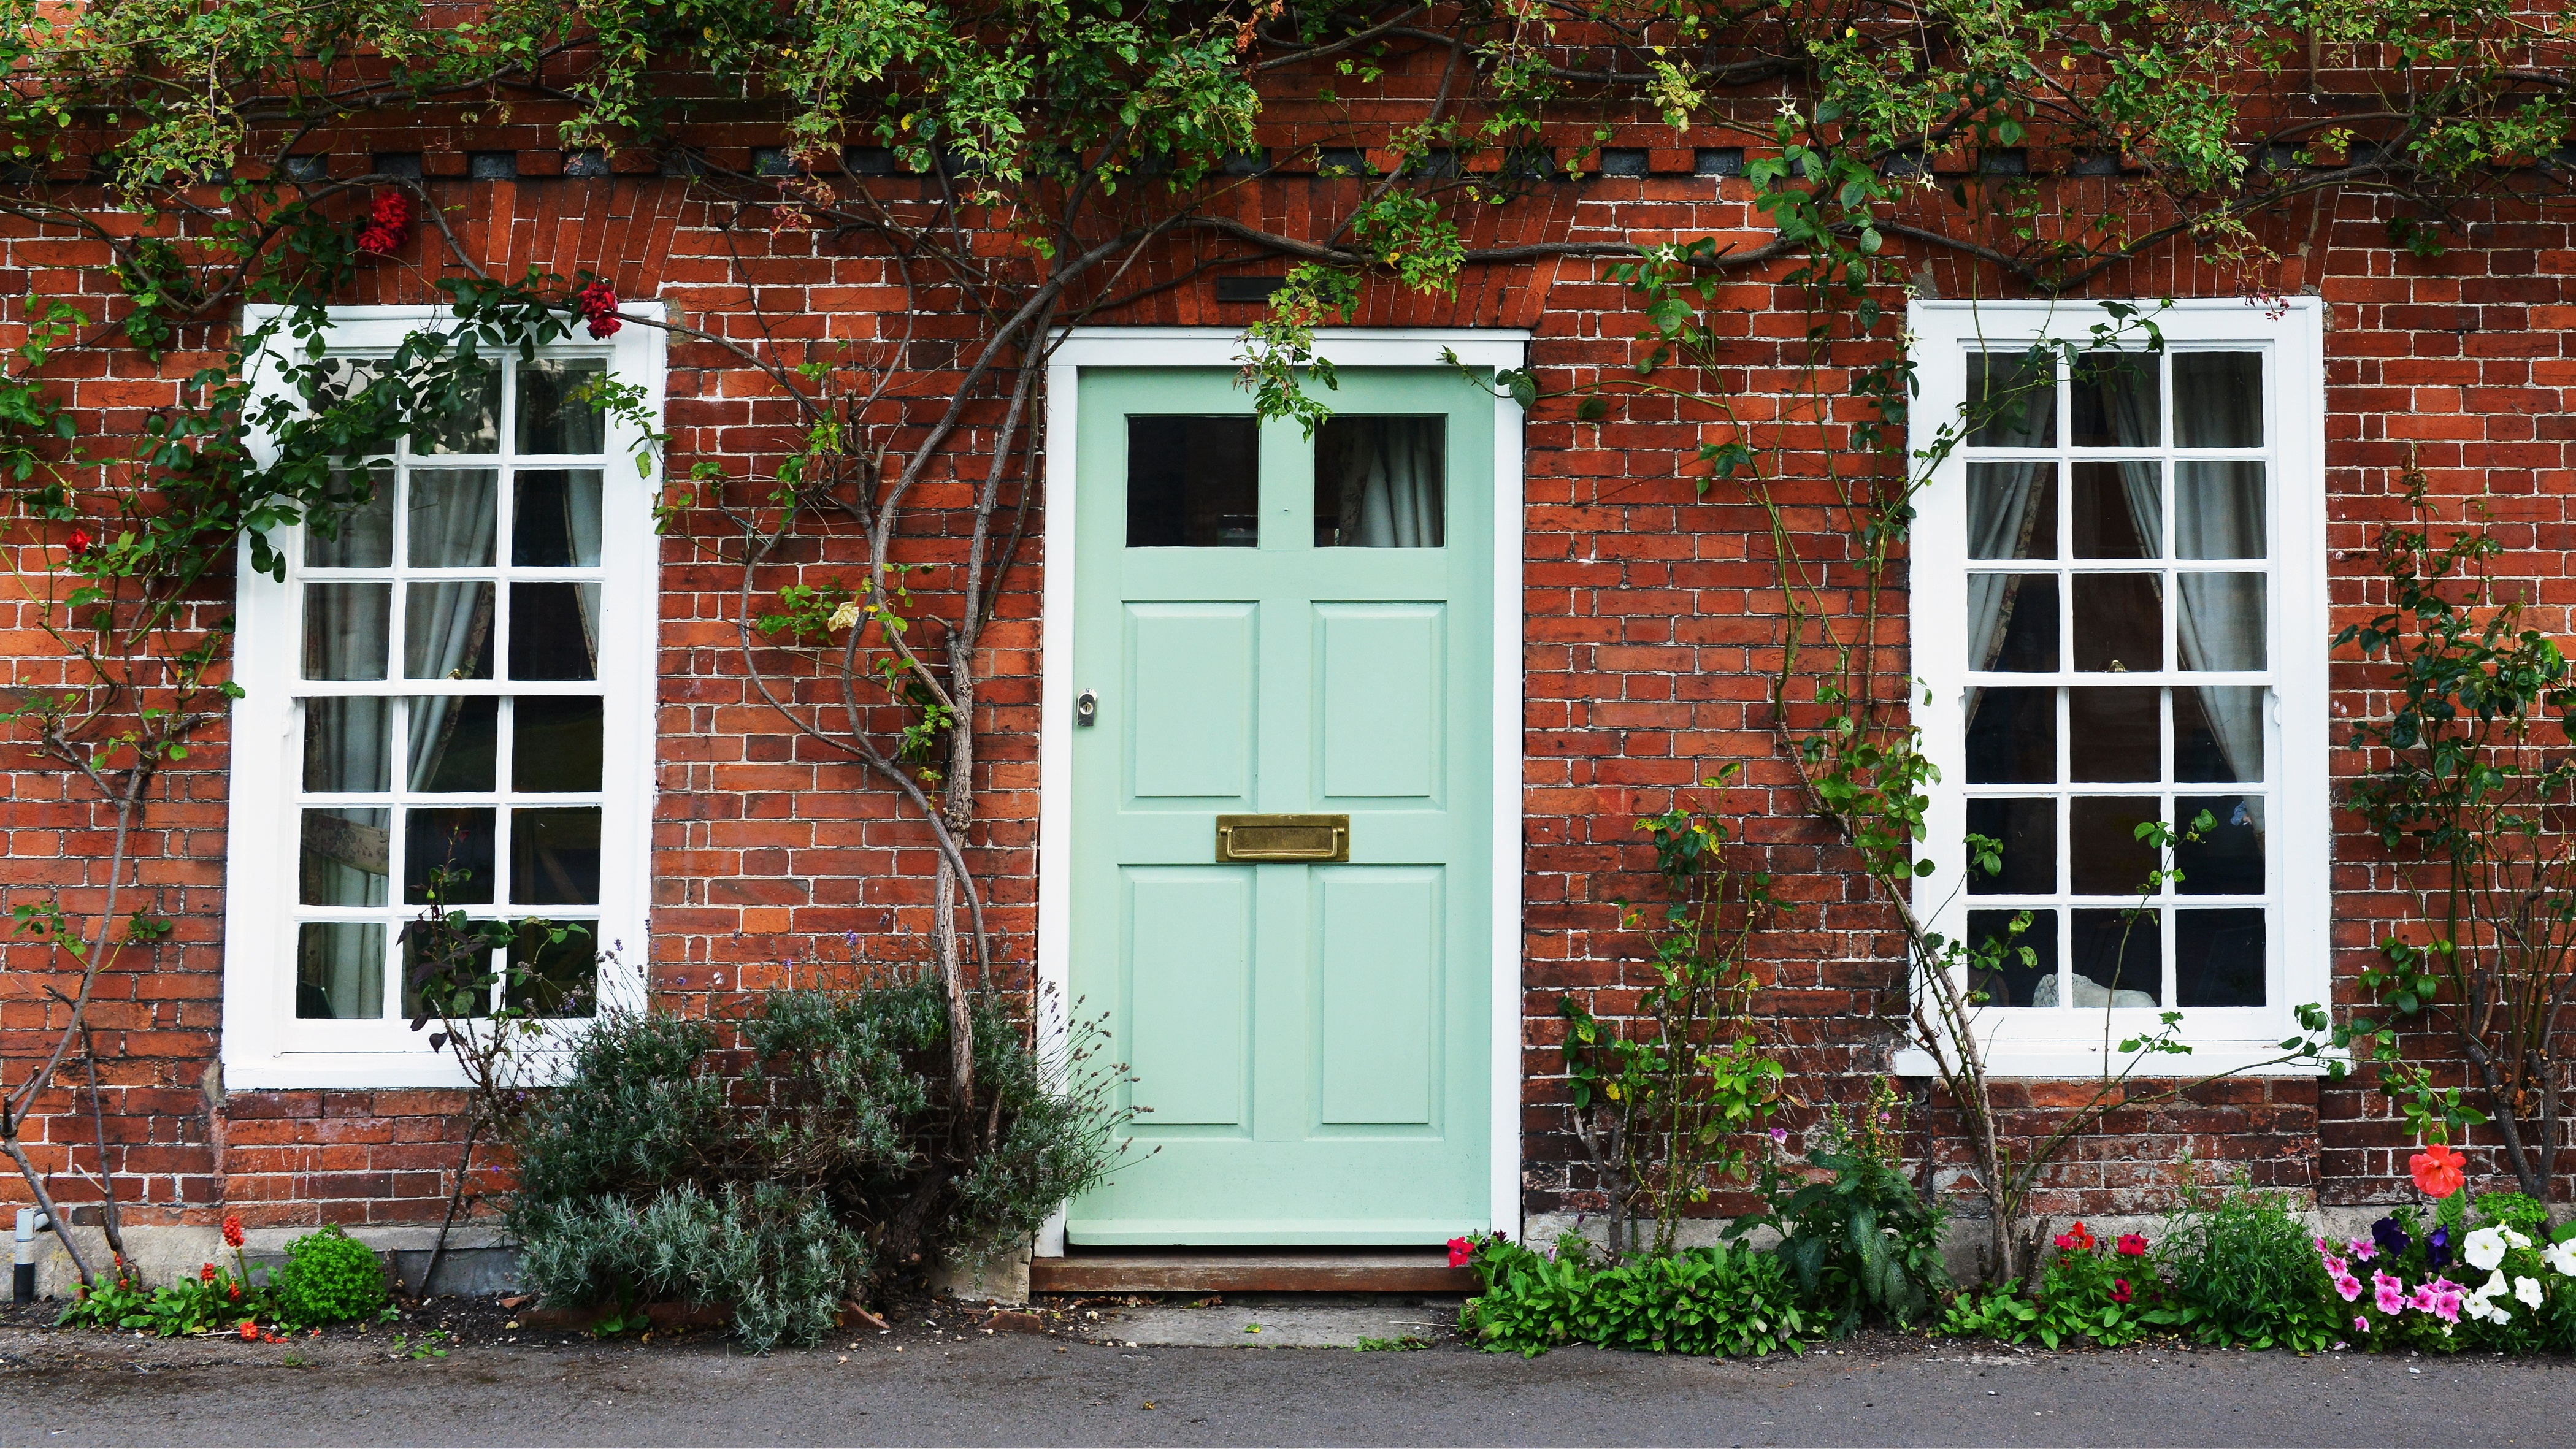 How to Fix Drafty Exterior Doors